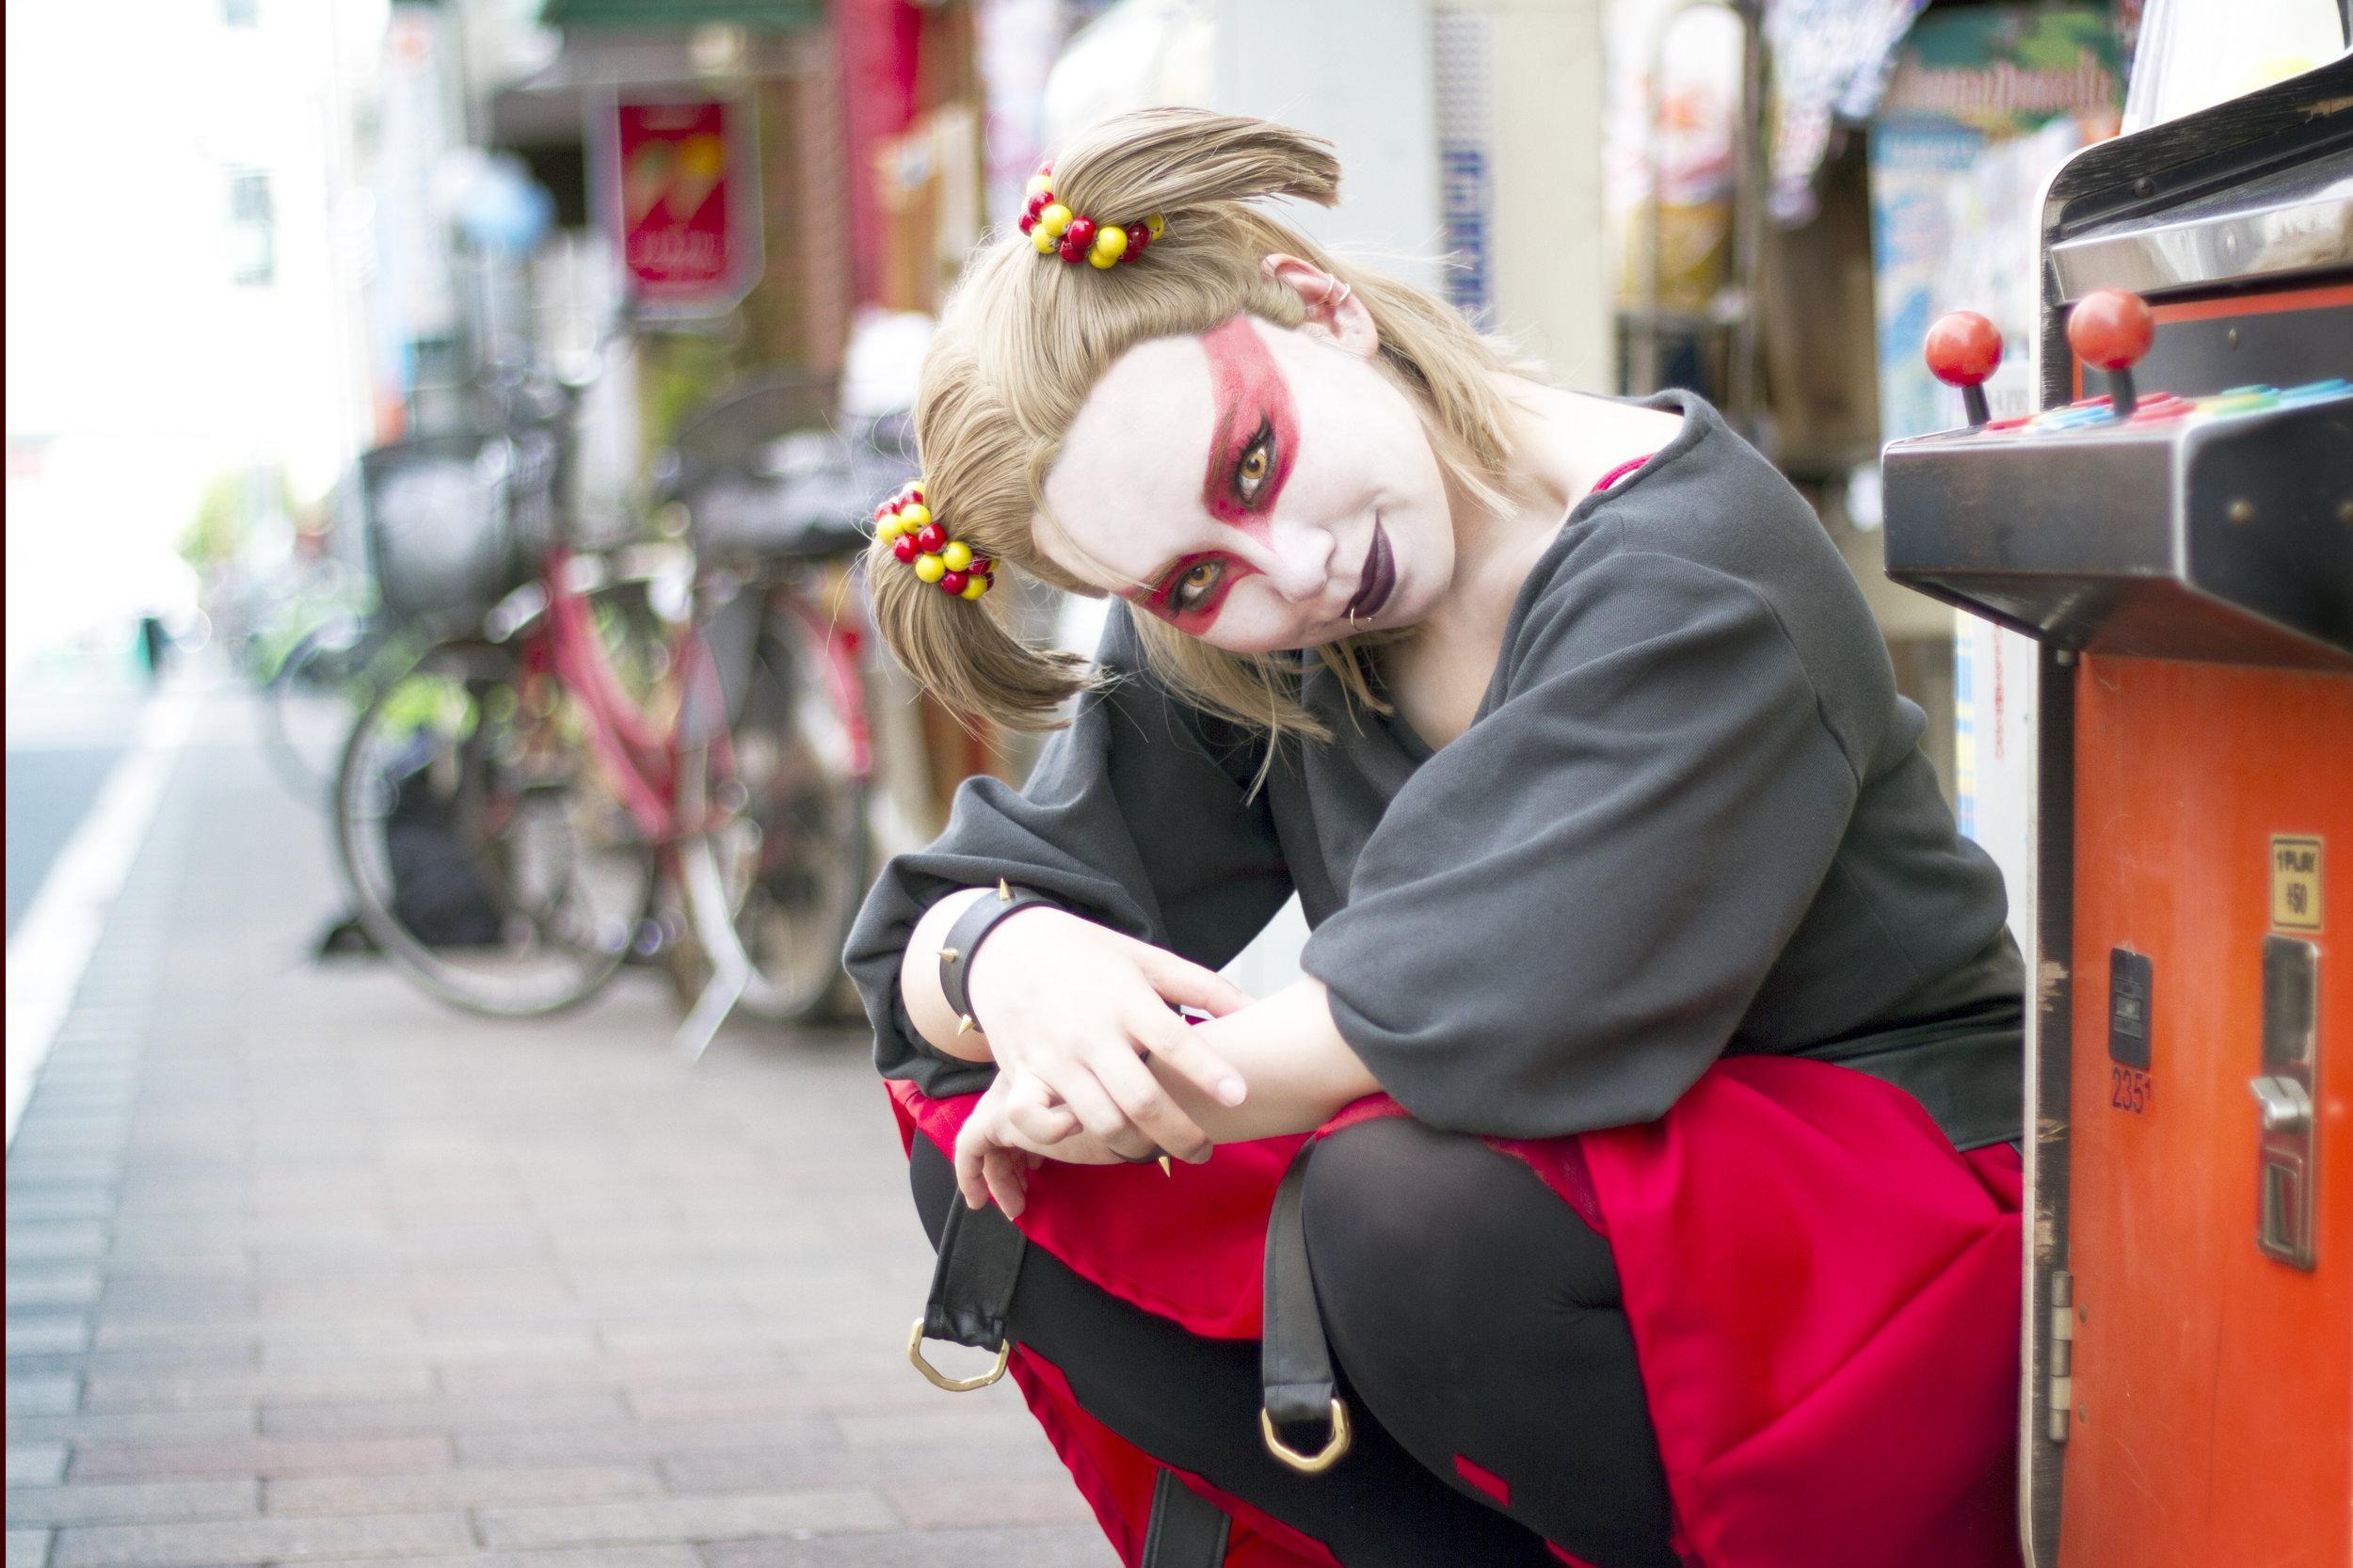 E_Inaba_cosplay_by_RaiNarumiya_and_WilliamGreenawalt_001.jpg